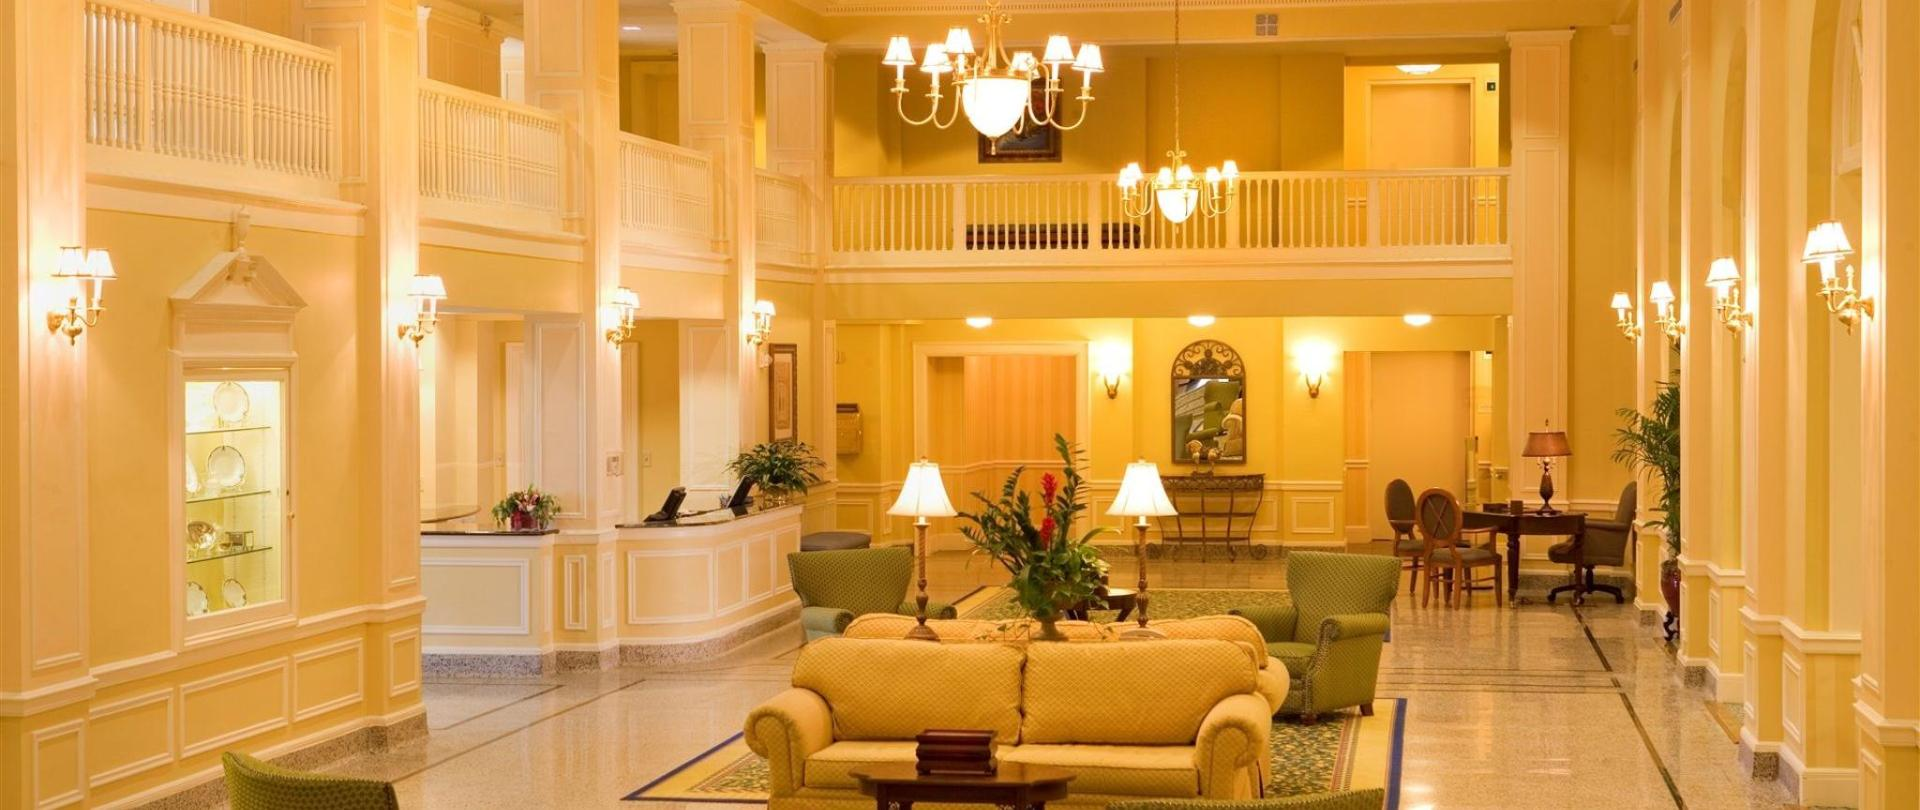 Stonewall Jackson Hotel Conference Center Staunton Va United States Of America